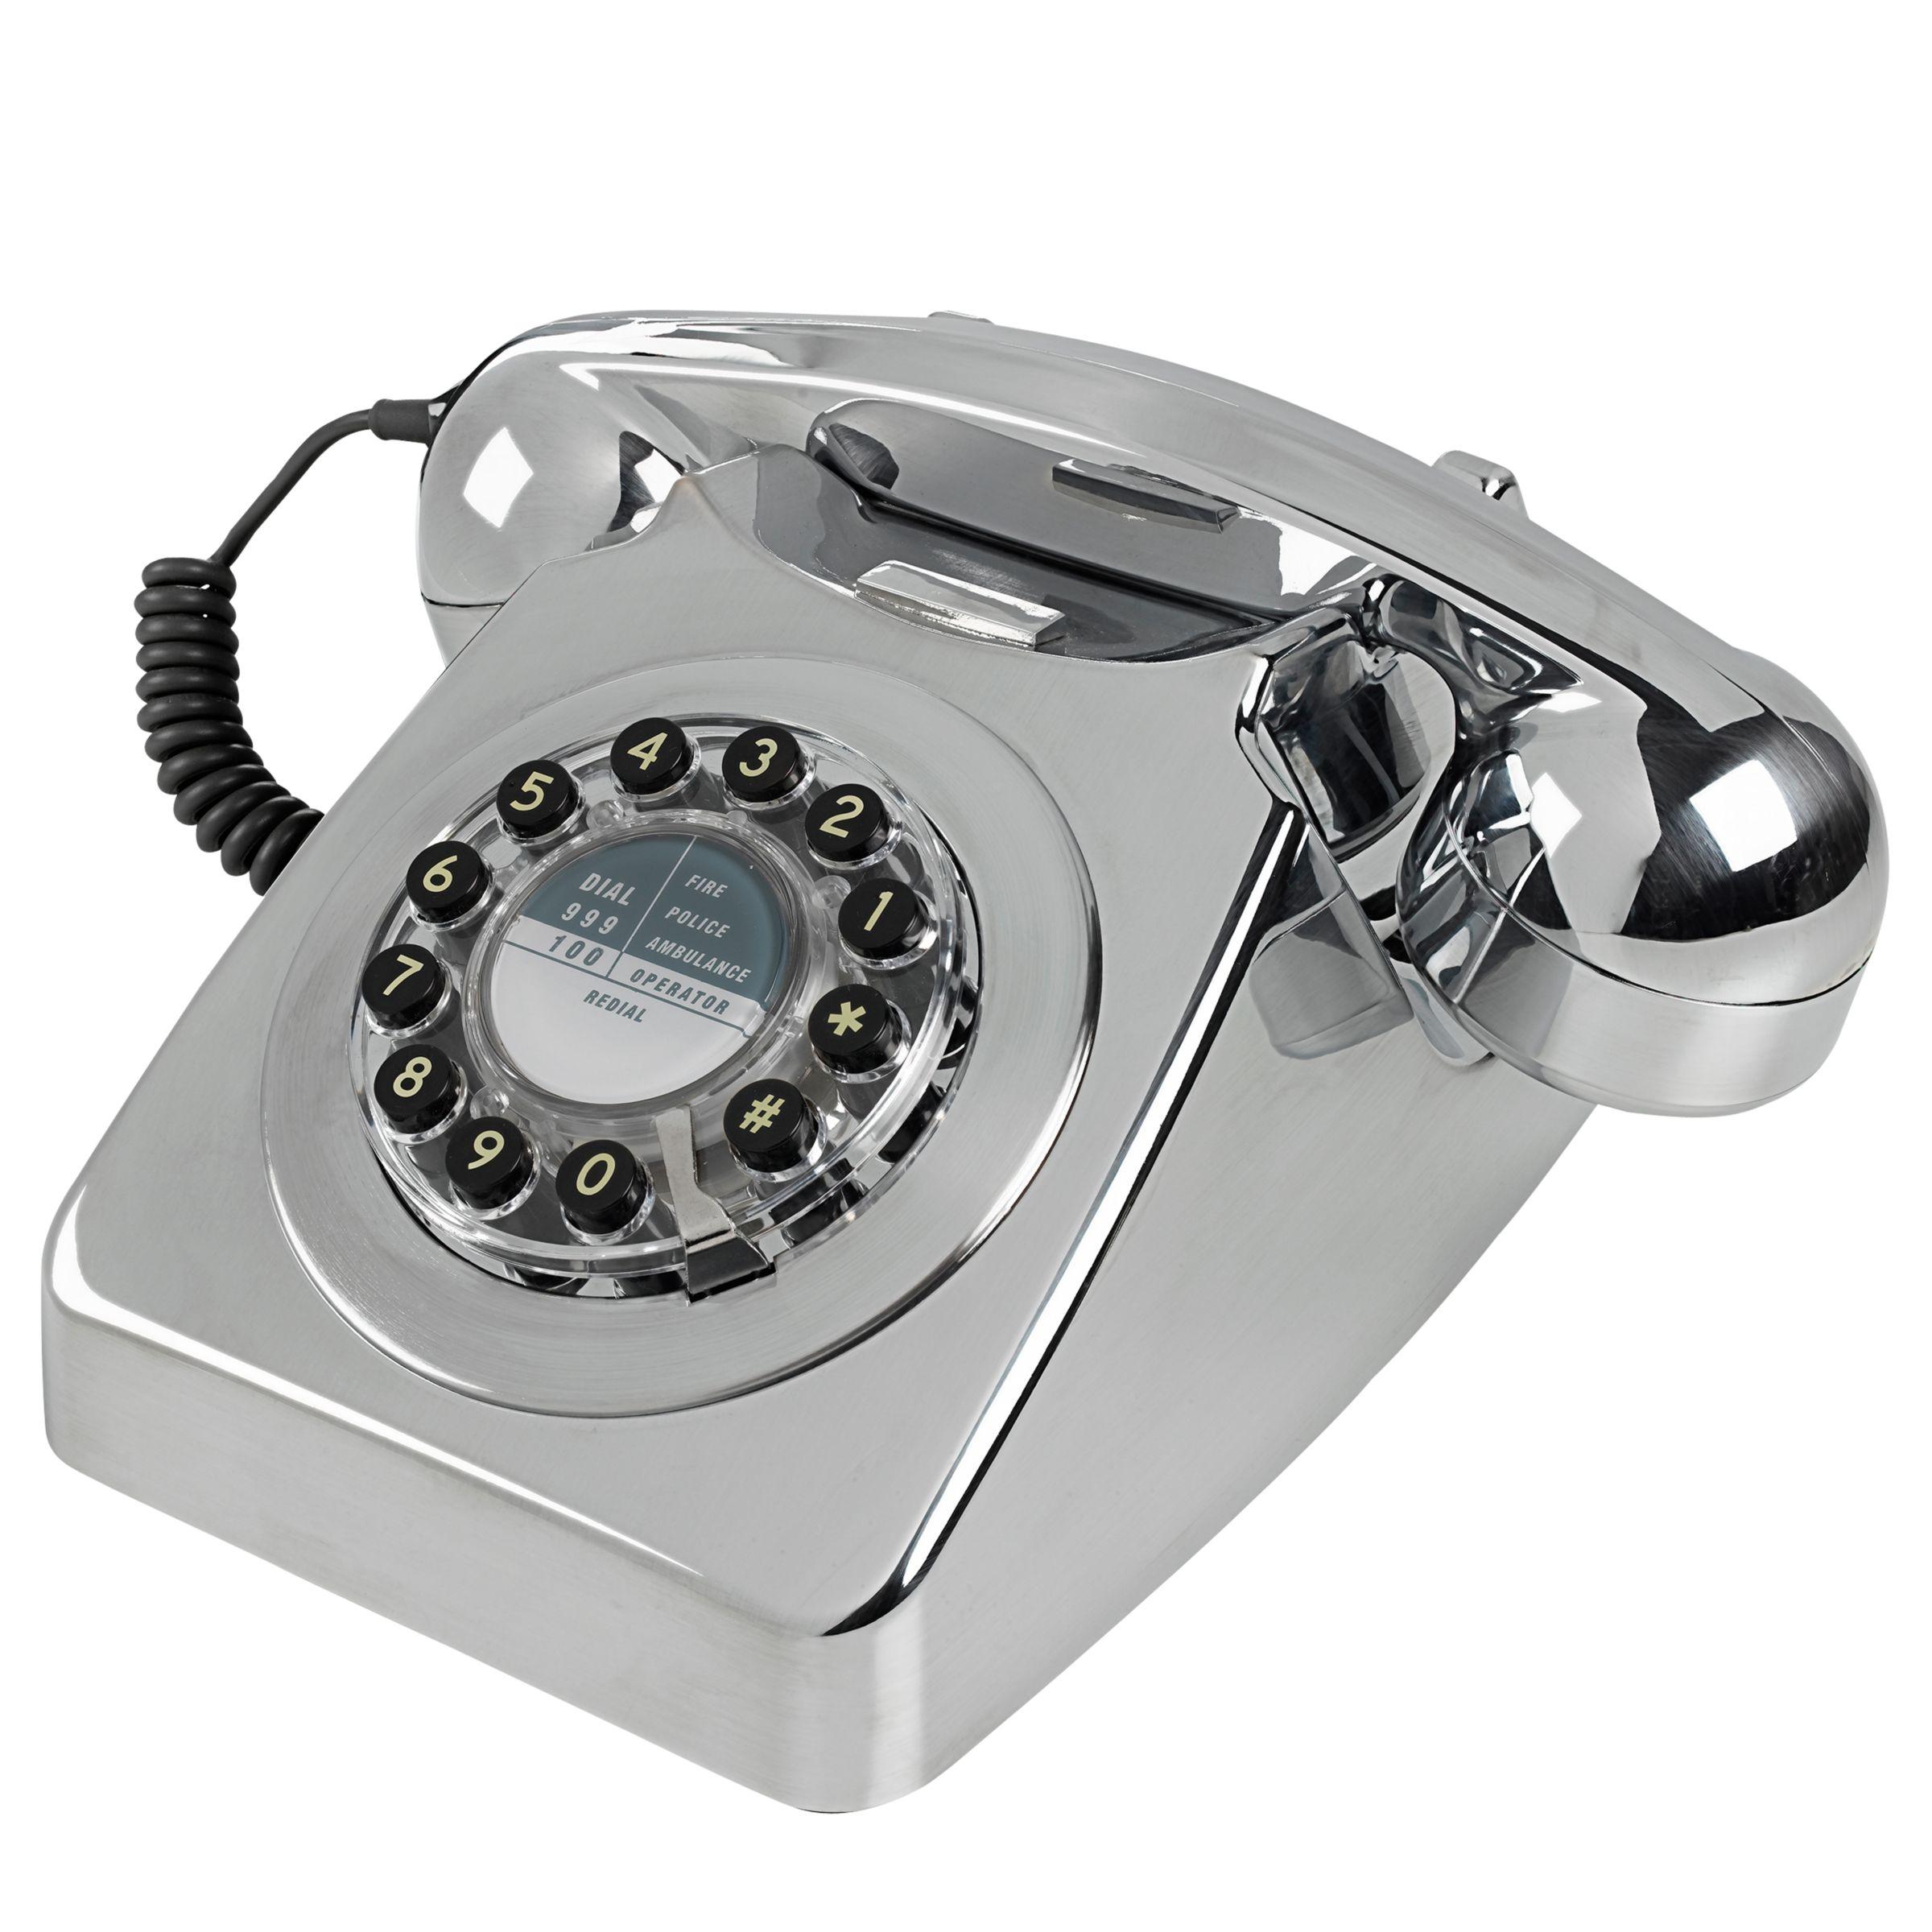 Wild & Wolf Wild & Wolf 746 1960s Corded Telephone, Copper